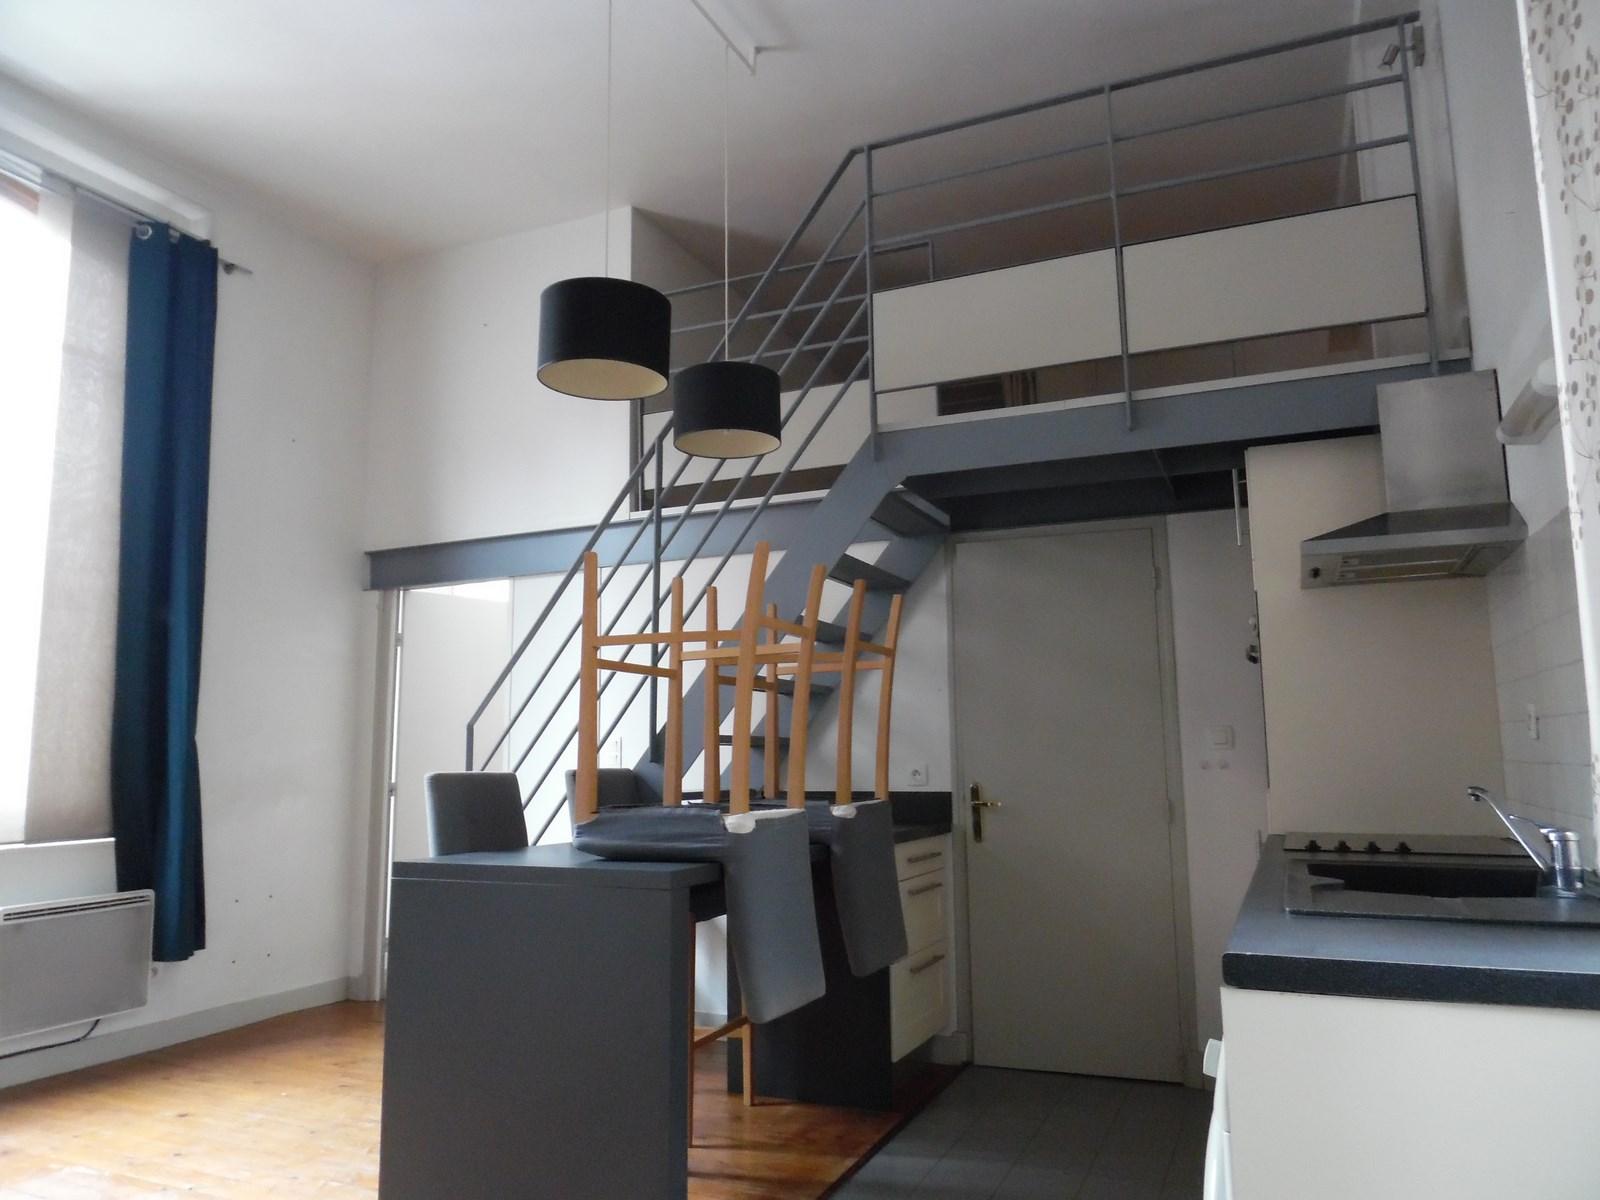 Location appartement Rouen : discutez au maximum